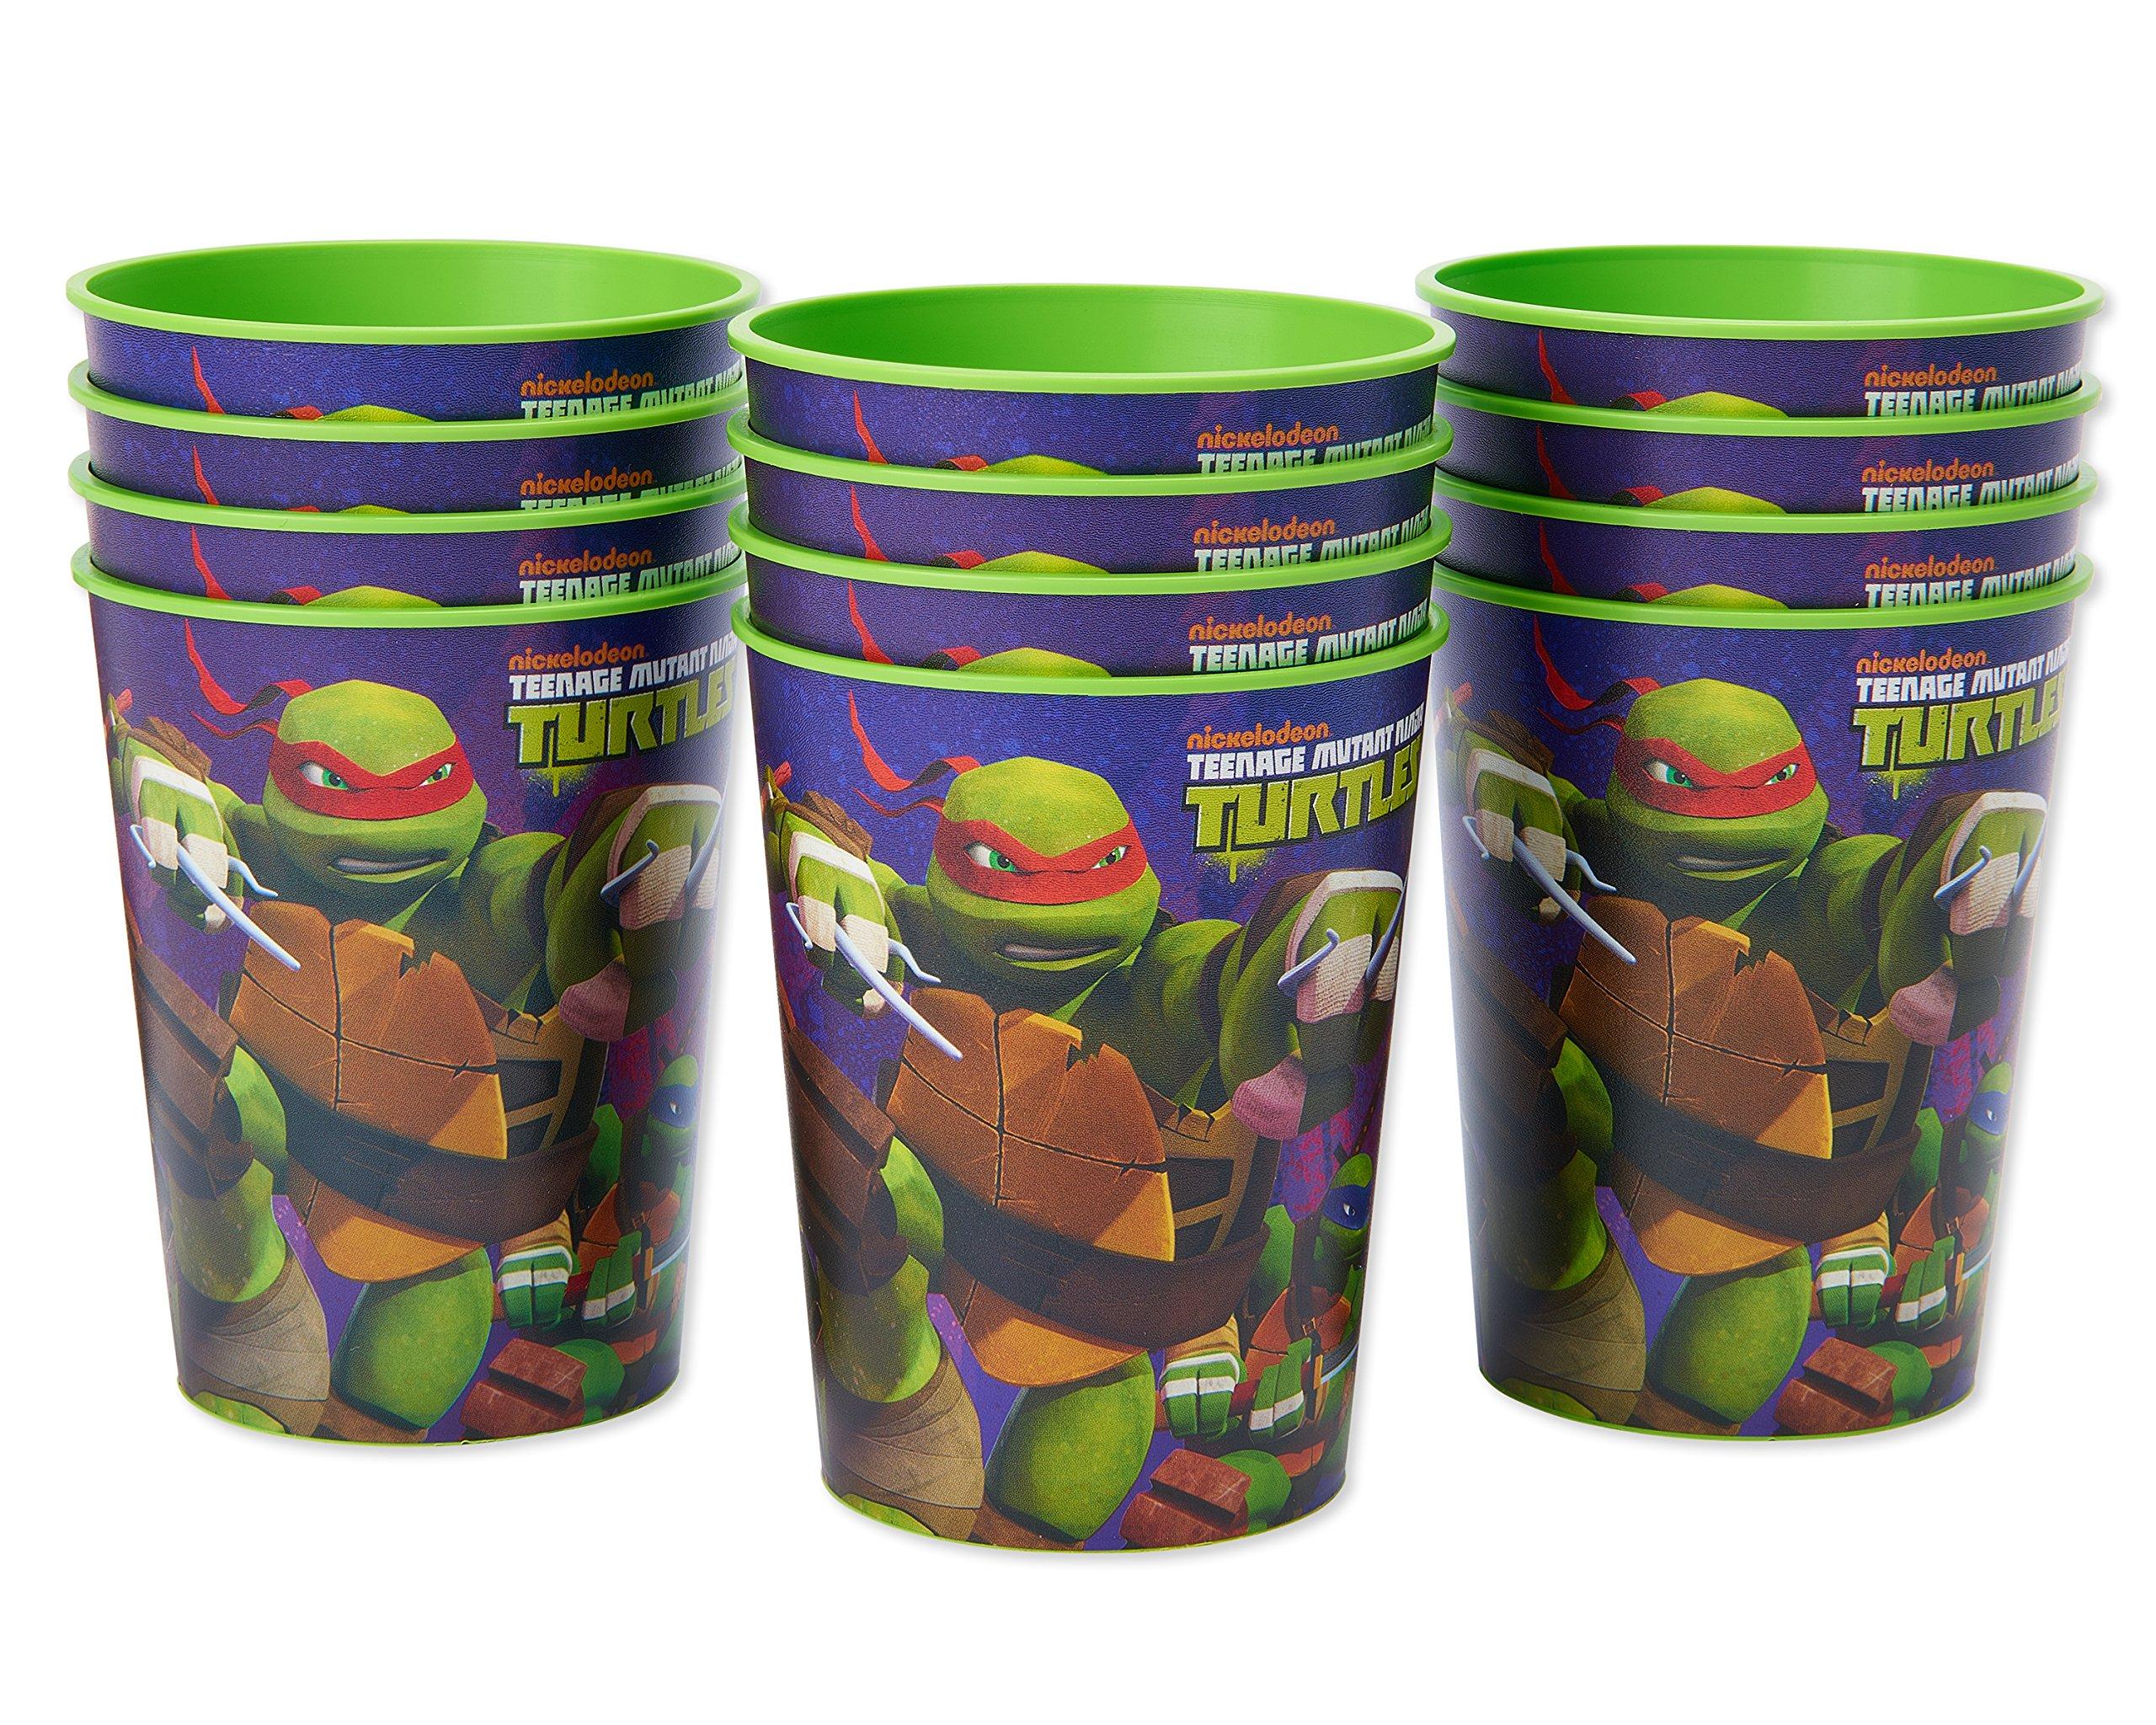 American Greetings Teenage Mutant Ninja Turtles (TMNT) Plastic Cups for Kids (12-Count)